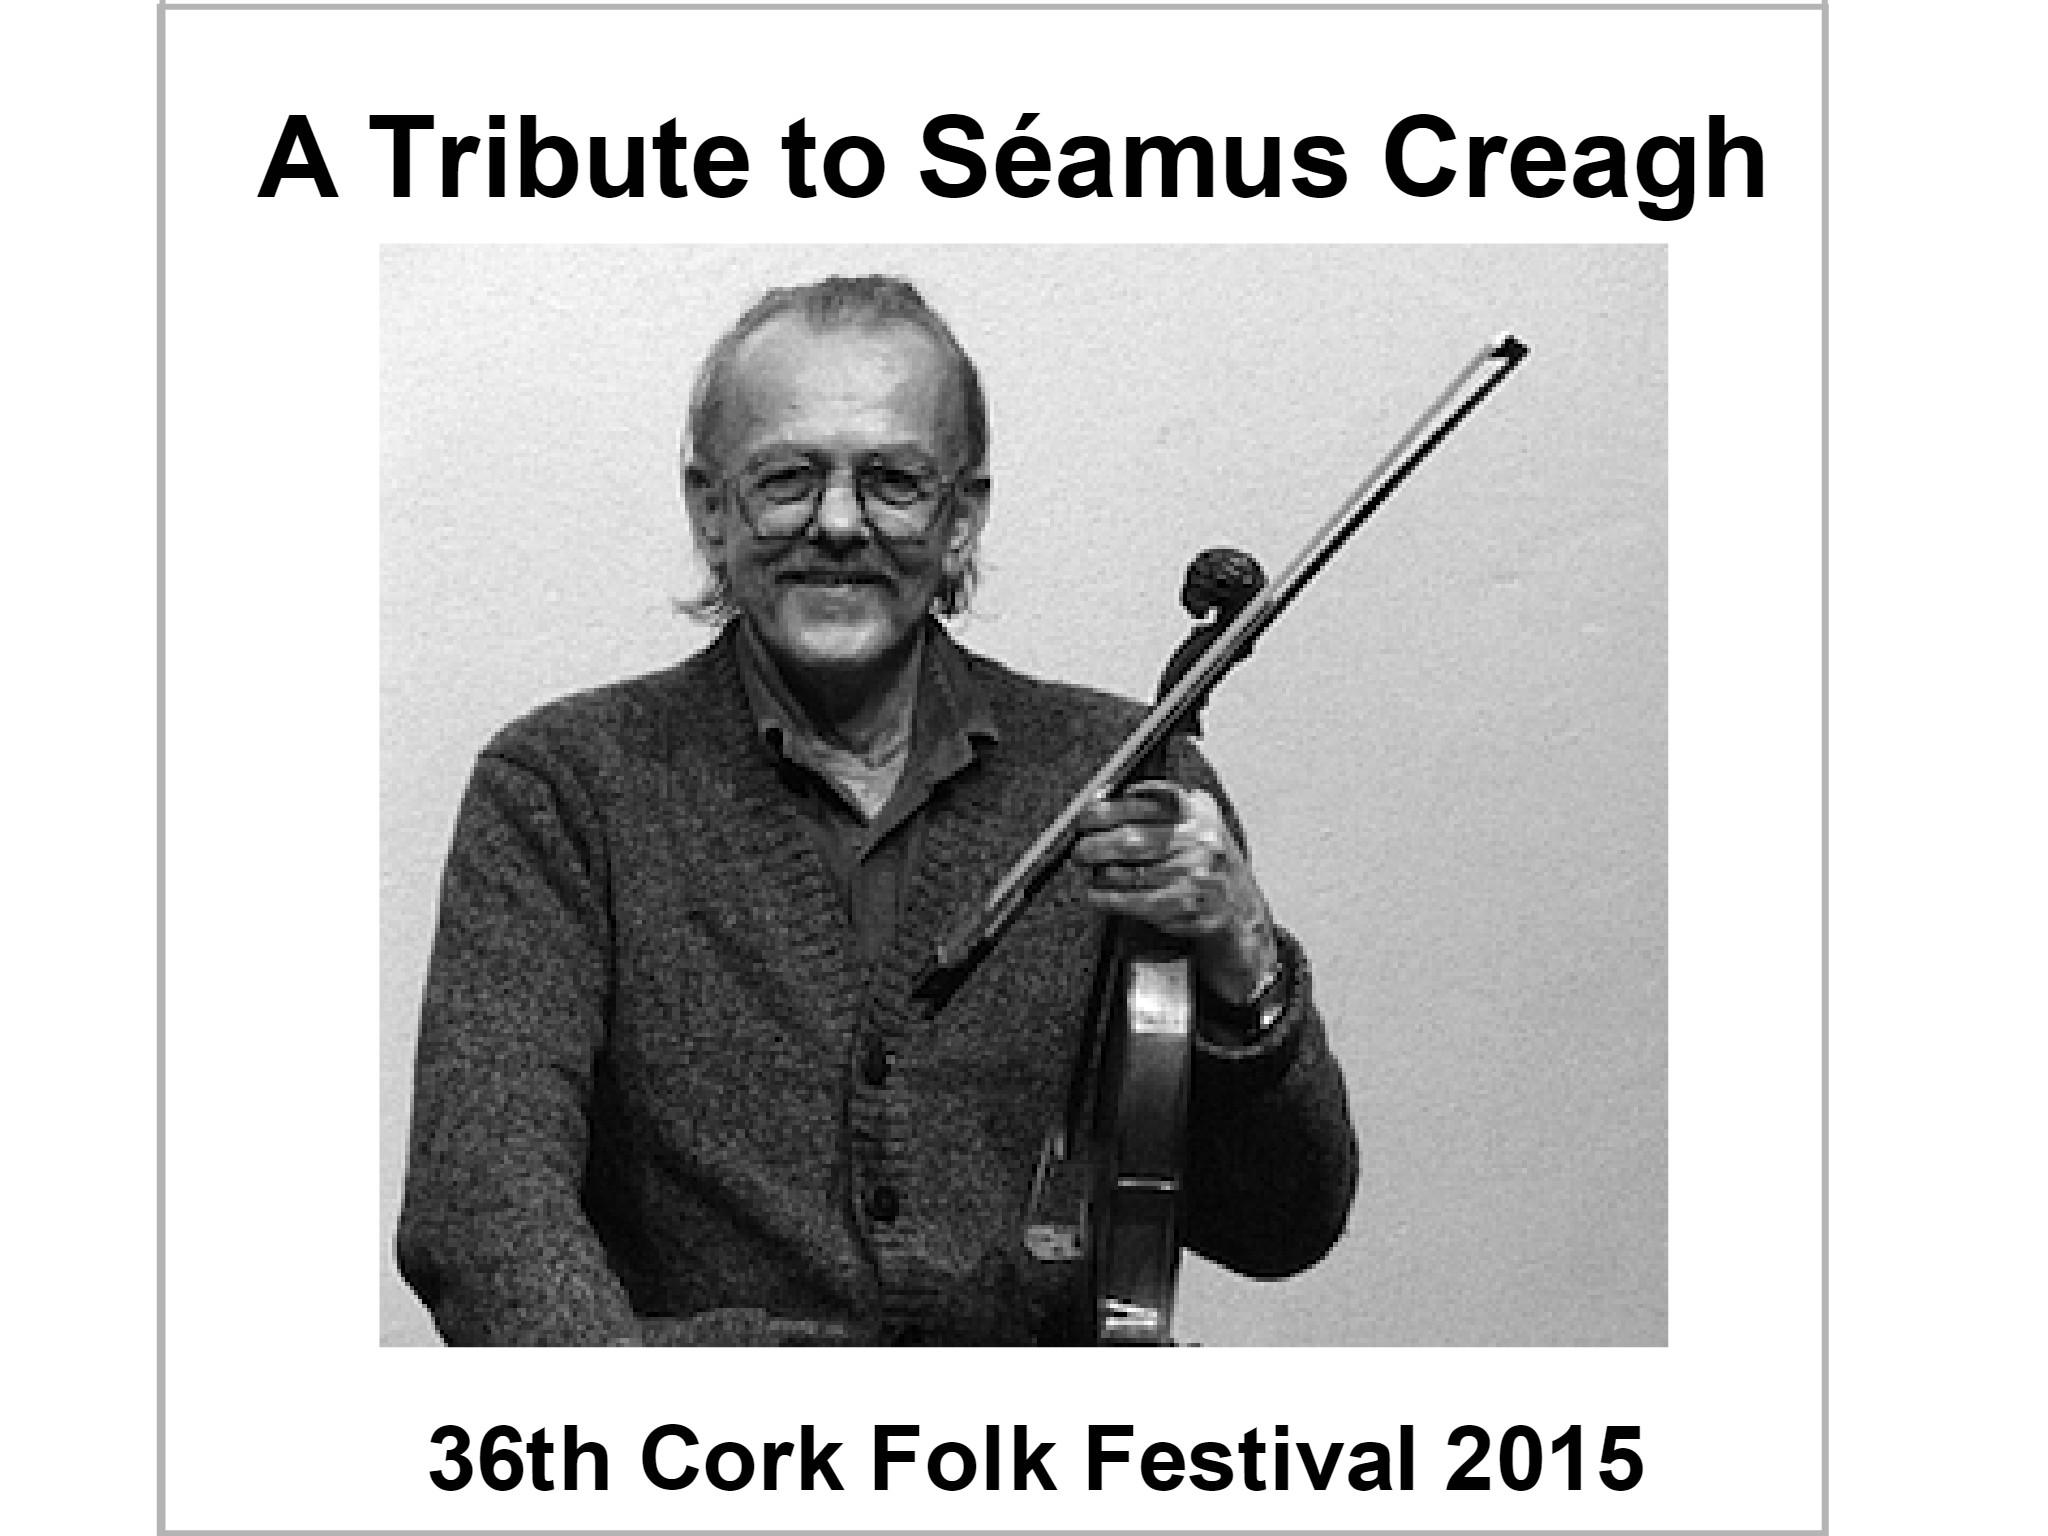 a tribute to seamus creagh logo